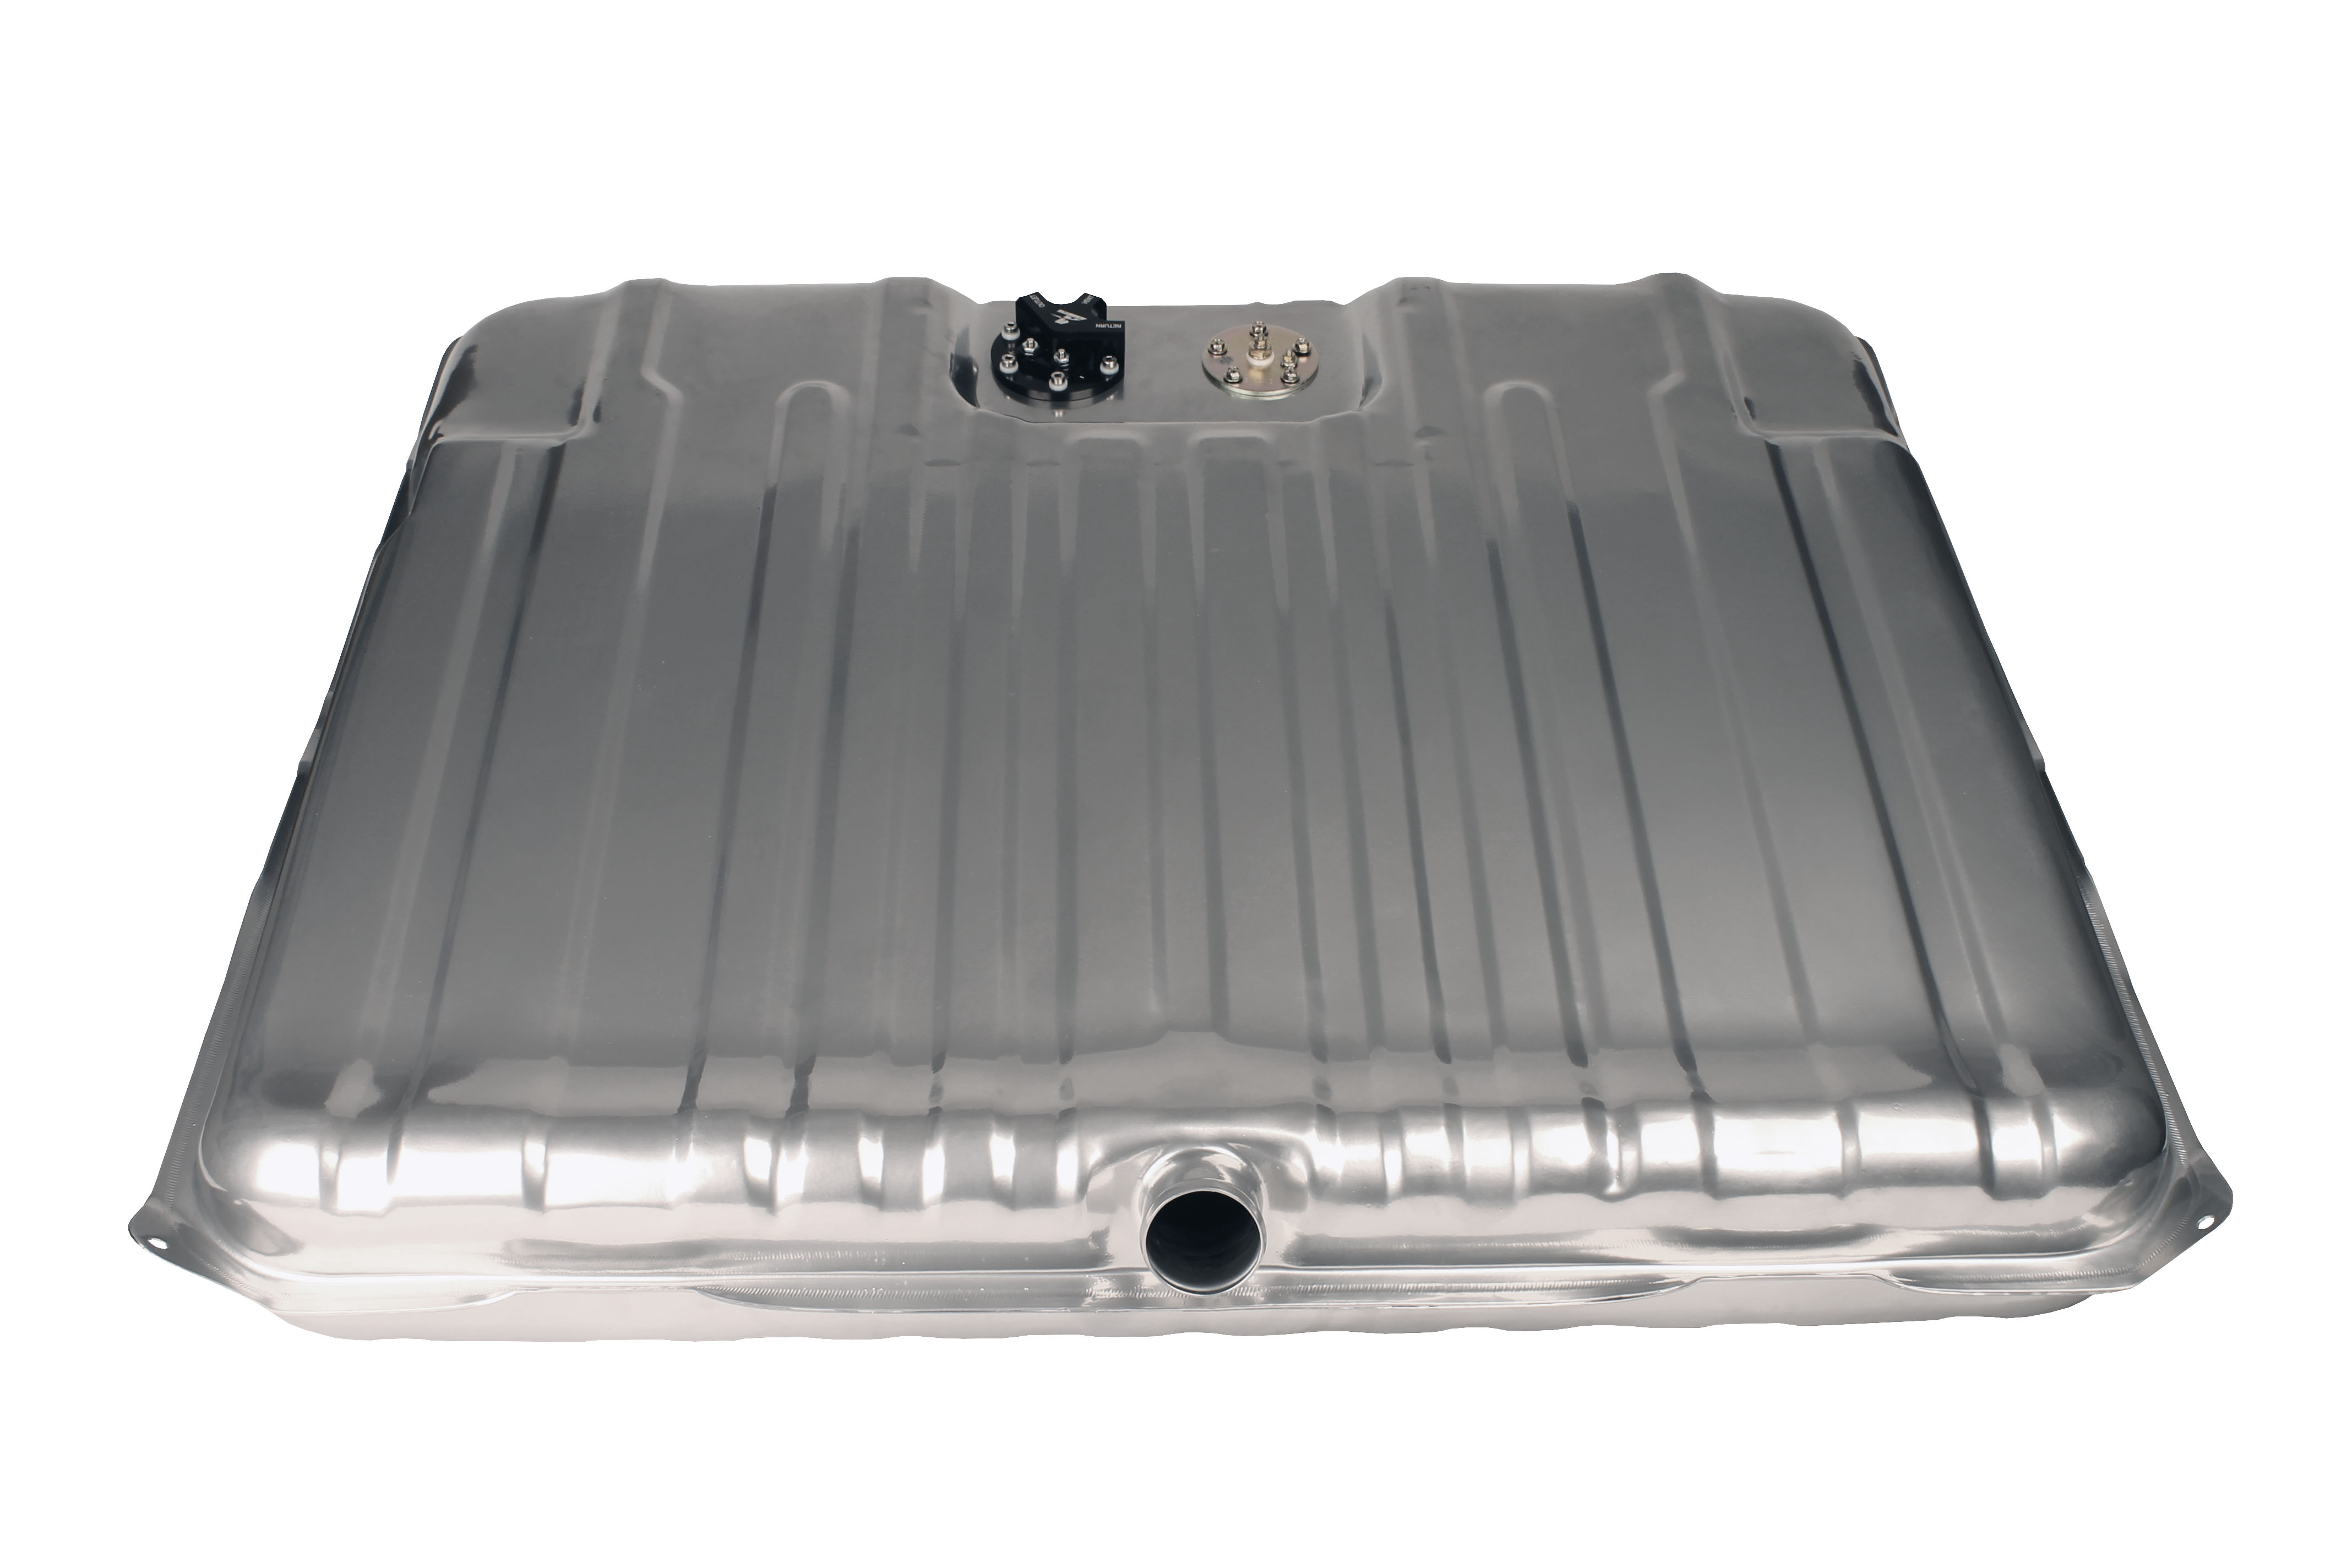 1964 Pontiac GTO Fuel Tank